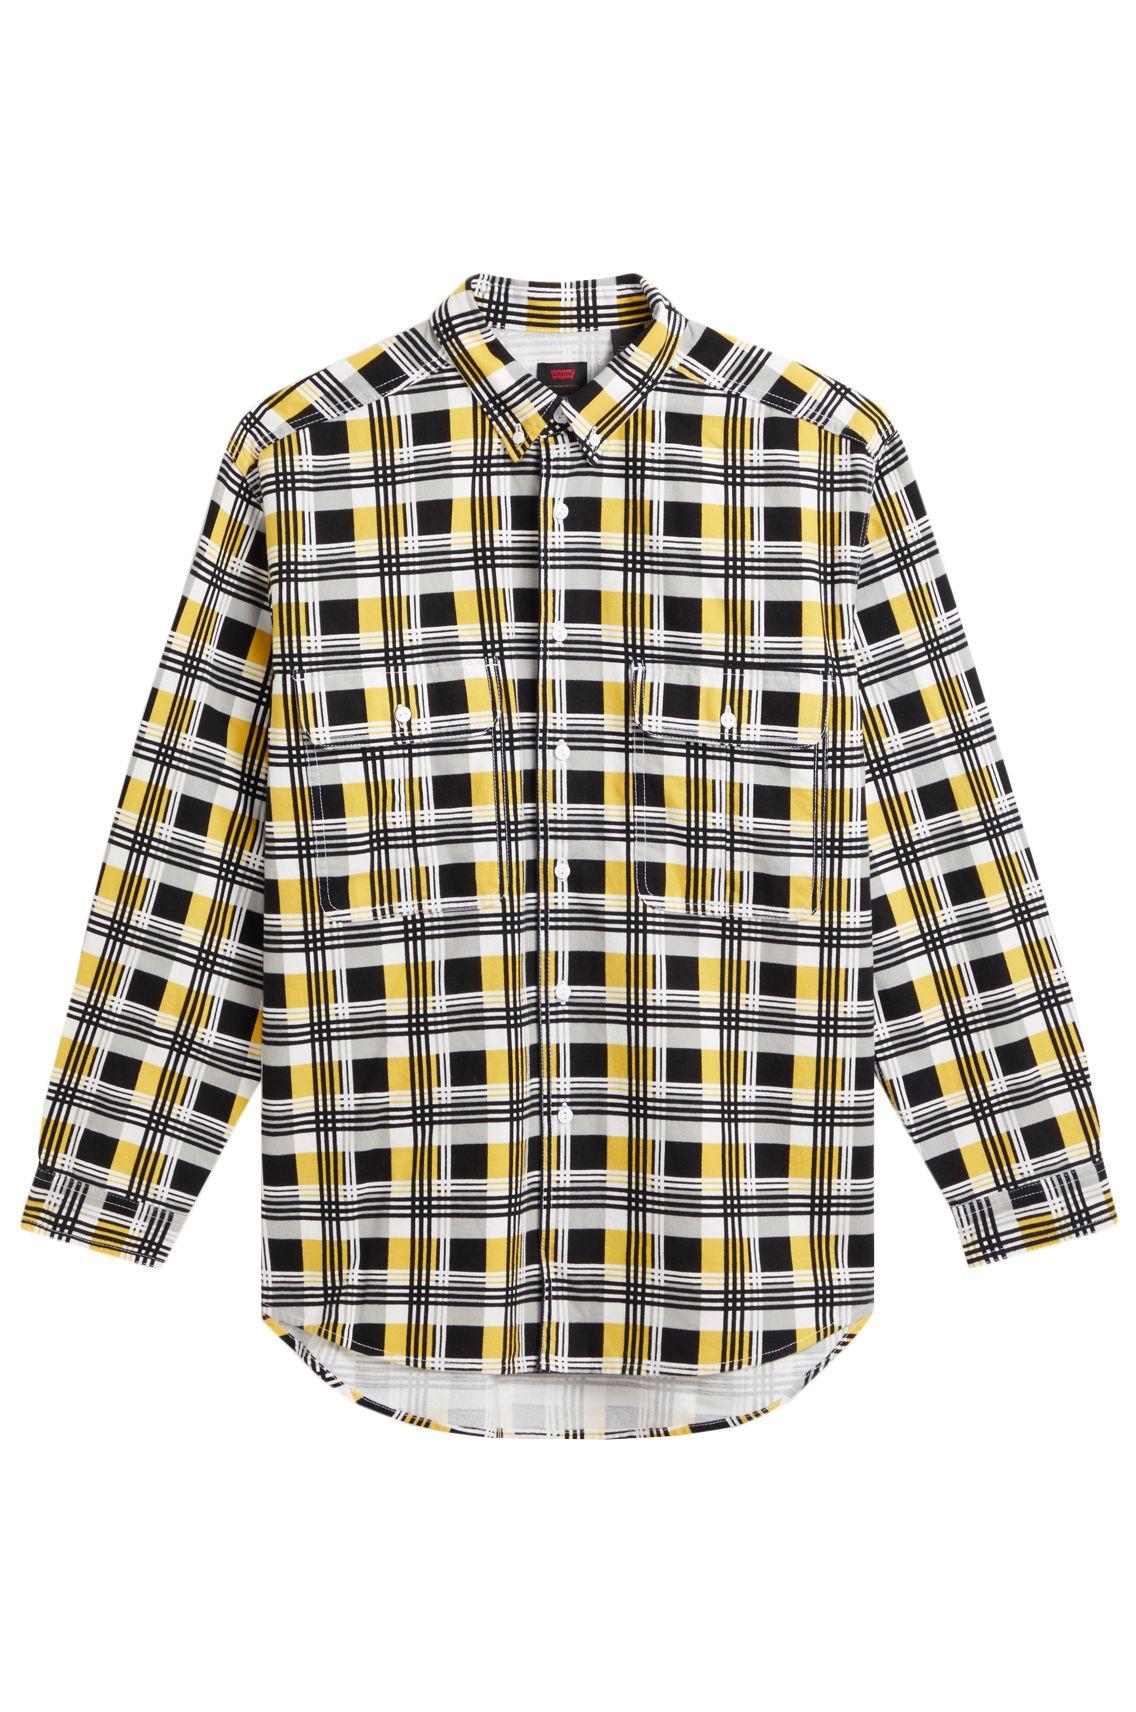 Levis Shirt SKATE L/S WOVEN Printed Black Yellow